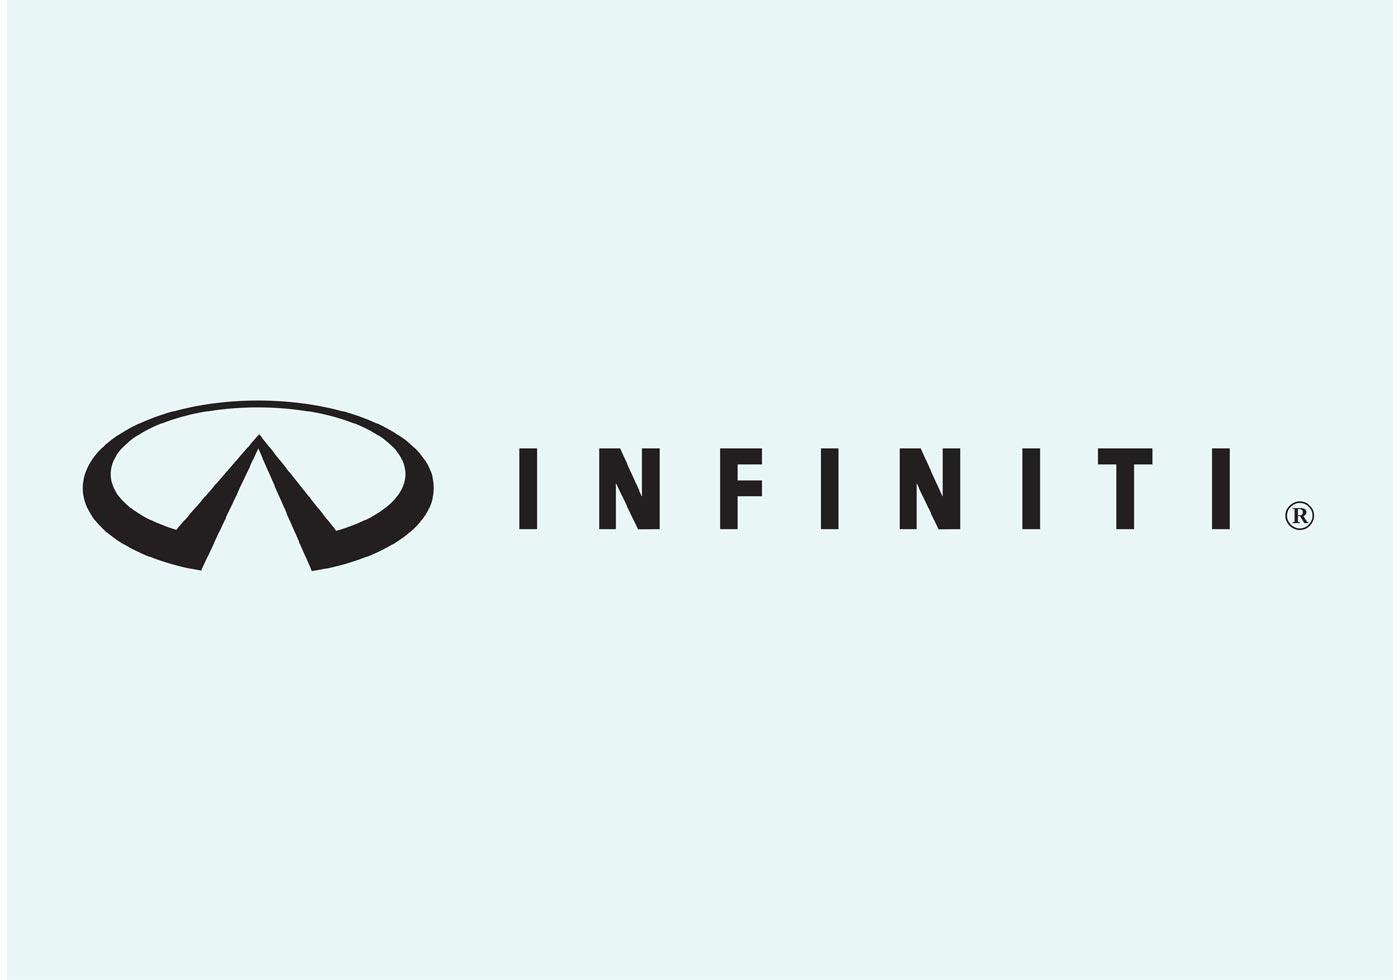 Infiniti Vector Logo